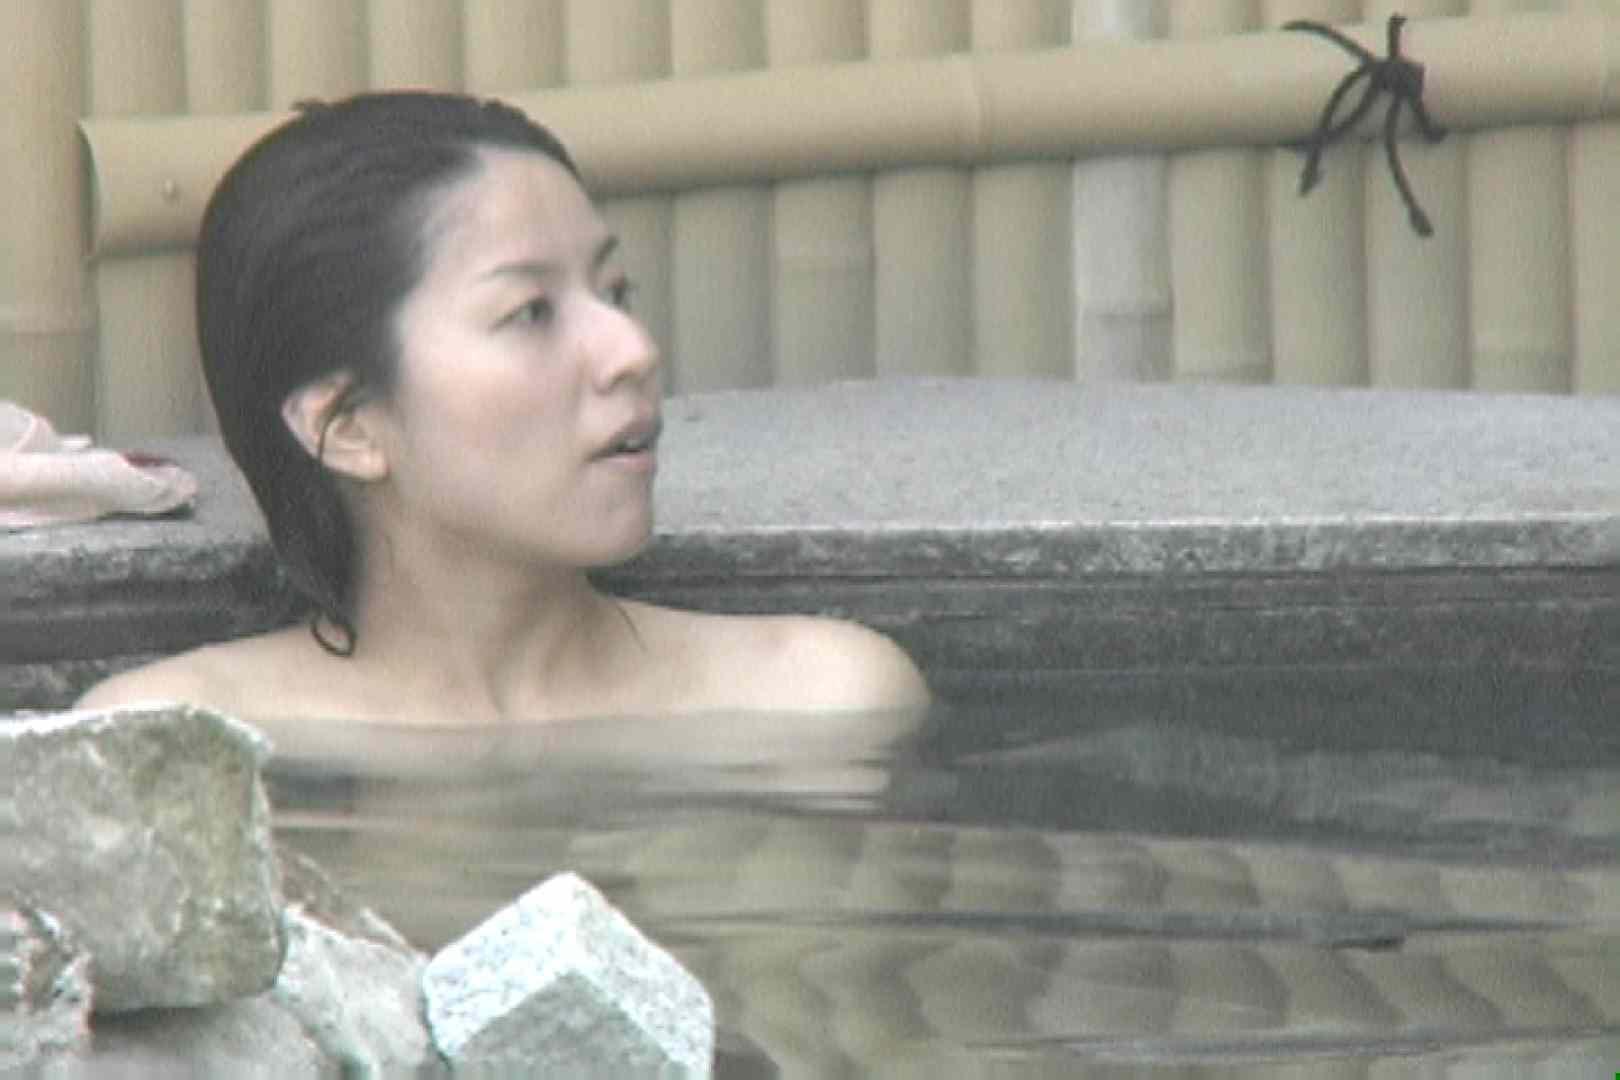 Aquaな露天風呂Vol.694 露天風呂編 | 盗撮シリーズ  83PIX 25